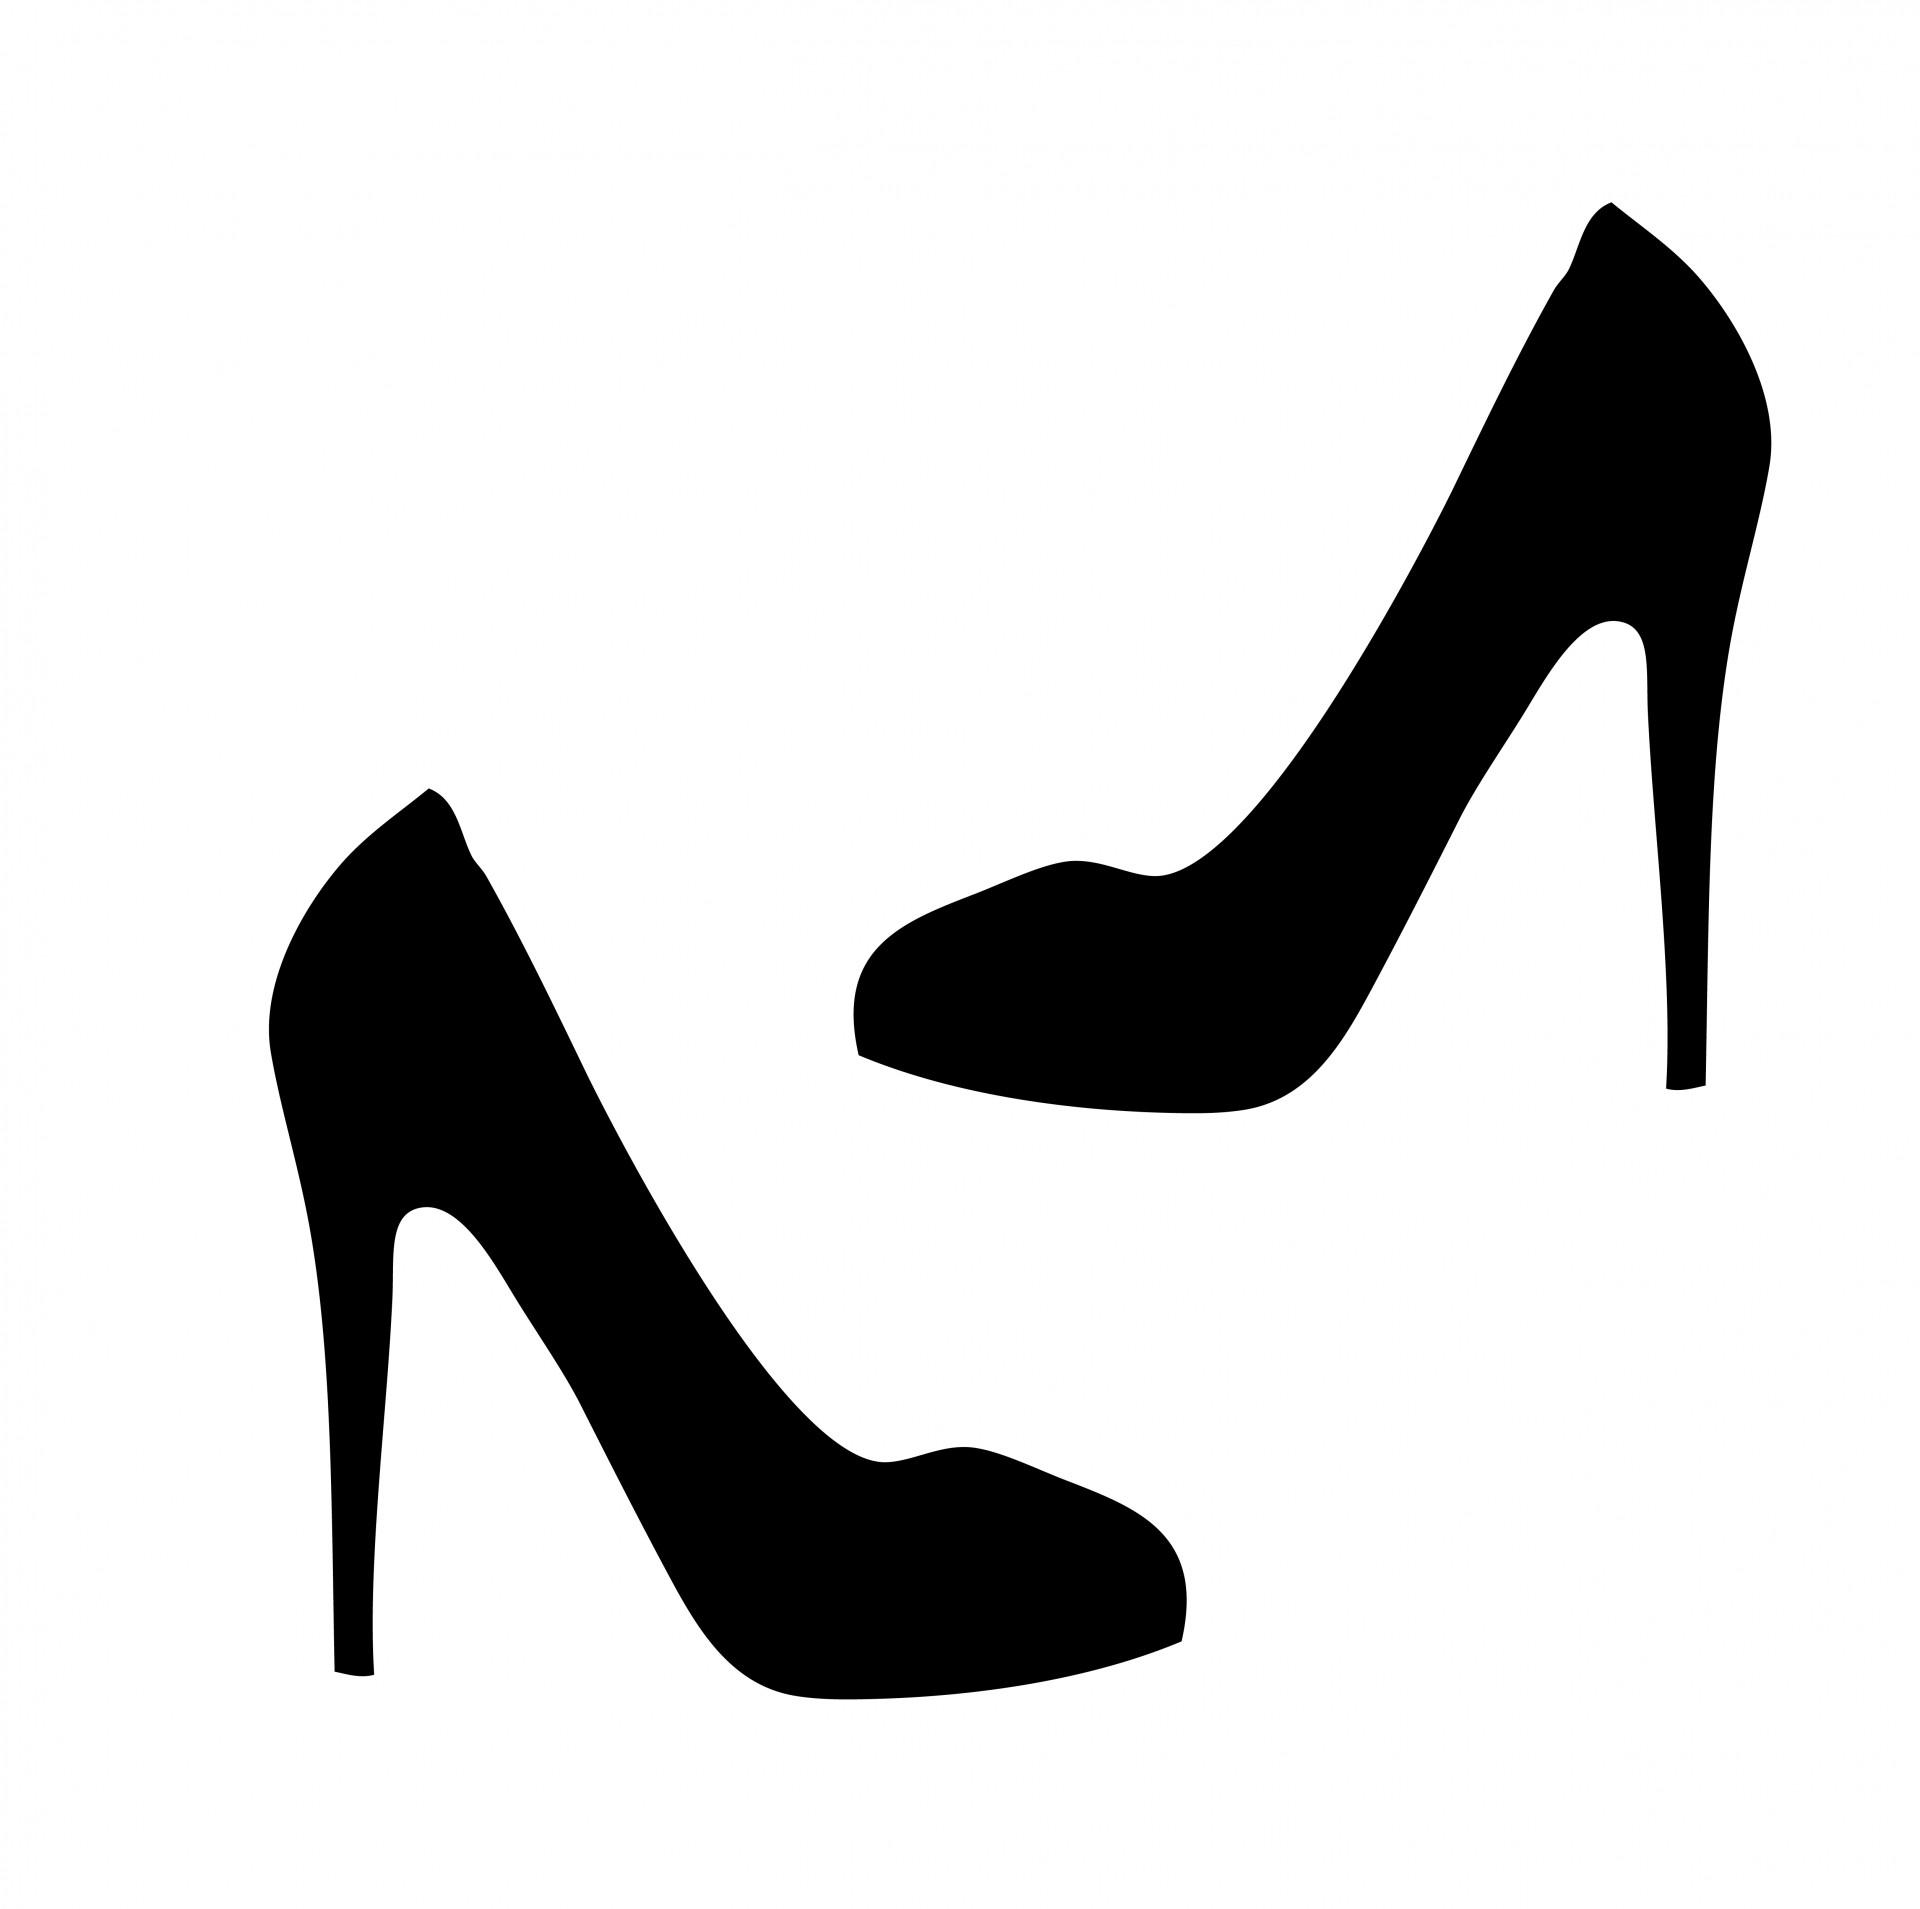 Shoe clipart images black background.